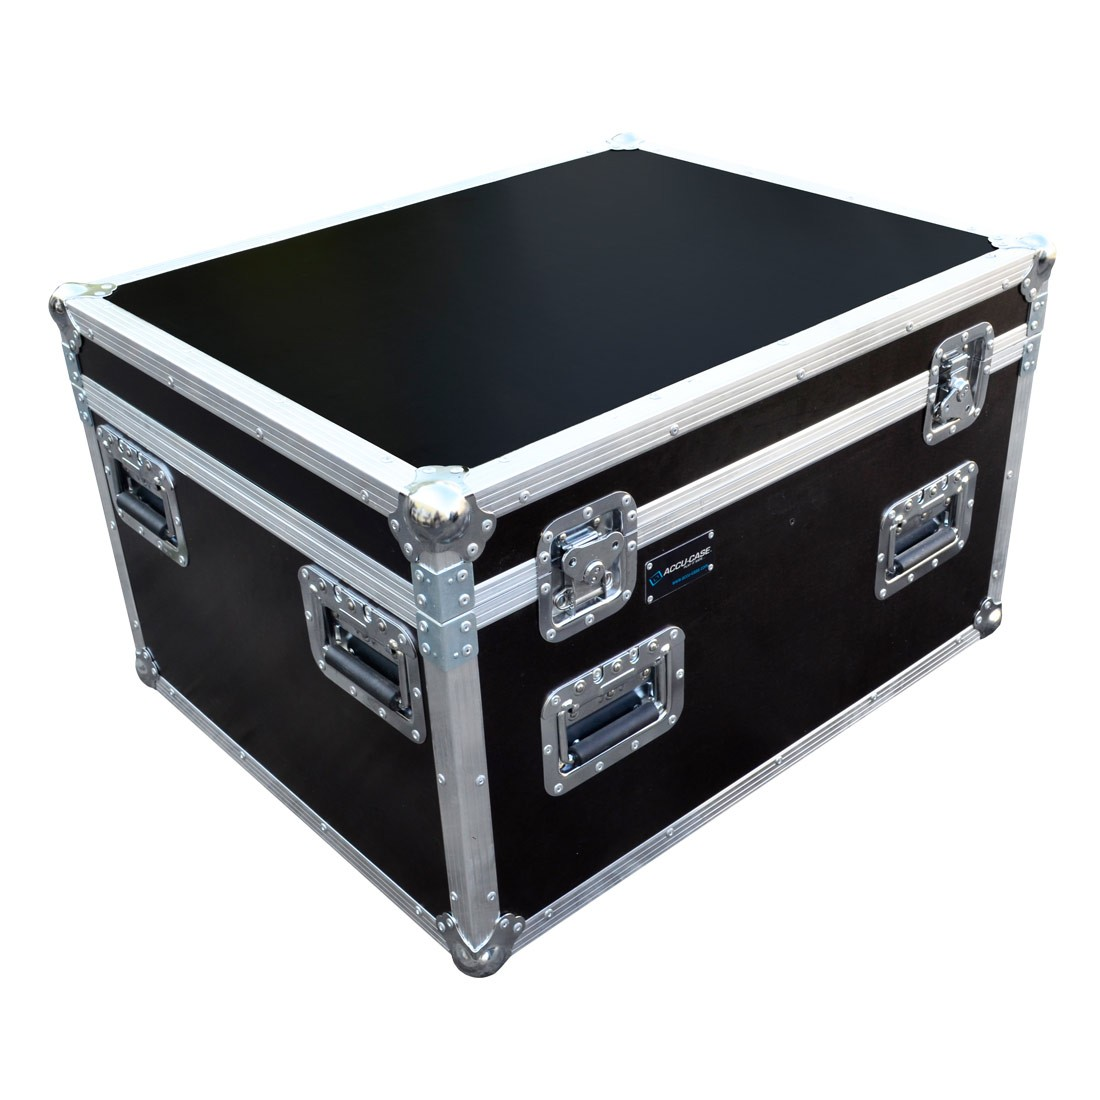 Adj Touring Case 4x Inno Color Beam Z19 Cases Light